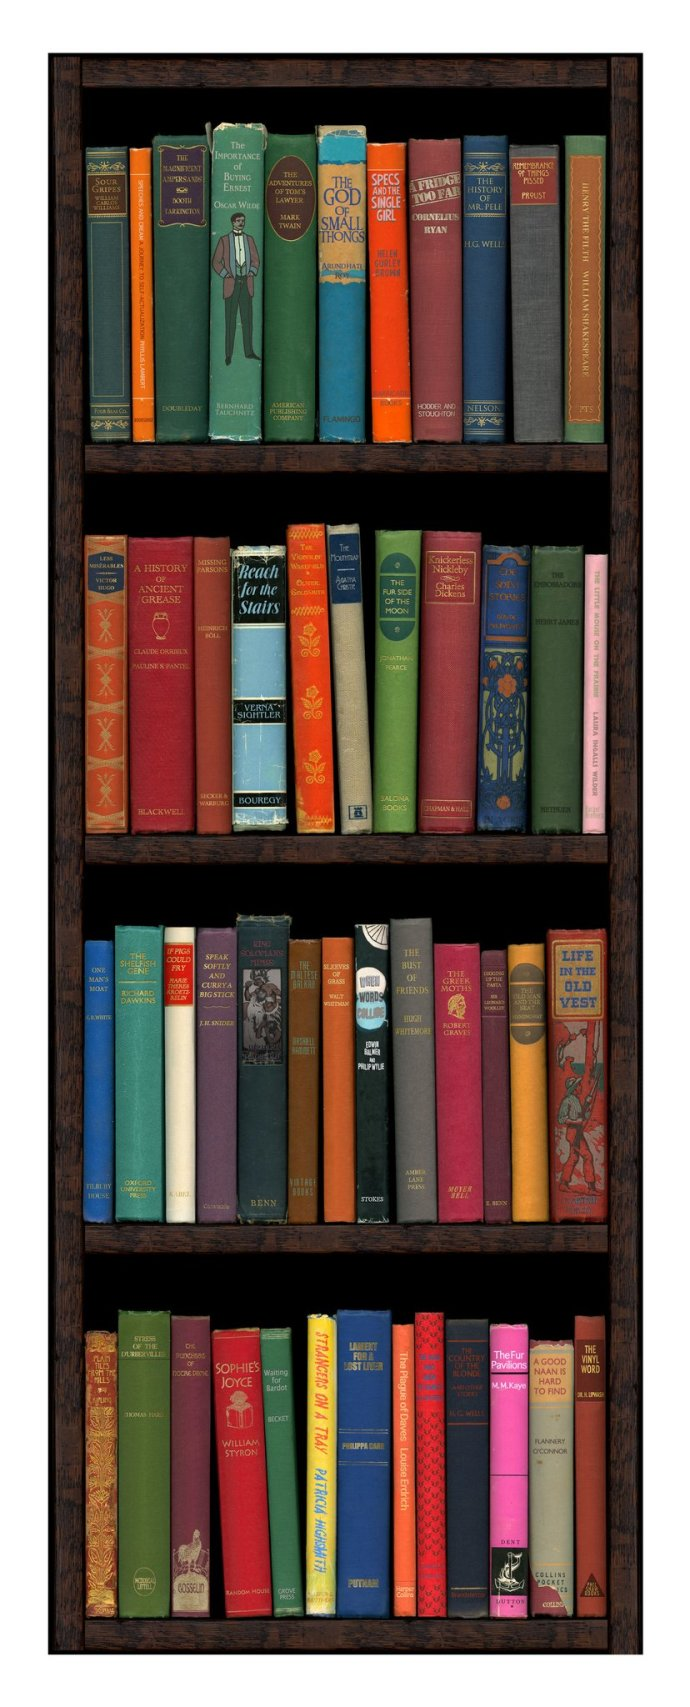 <div class=&#34;artist&#34;><strong>Phil Shaw</strong></div><div class=&#34;title&#34;><em>Fiction 12</em>, 2011</div><div class=&#34;medium&#34;>eight colour pigment based archival print on Hahnemuhle paper</div><div class=&#34;dimensions&#34;>116.8 x 50.8 cm<br>46 x 20 in</div><div class=&#34;edition_details&#34;>edition of 45</div>